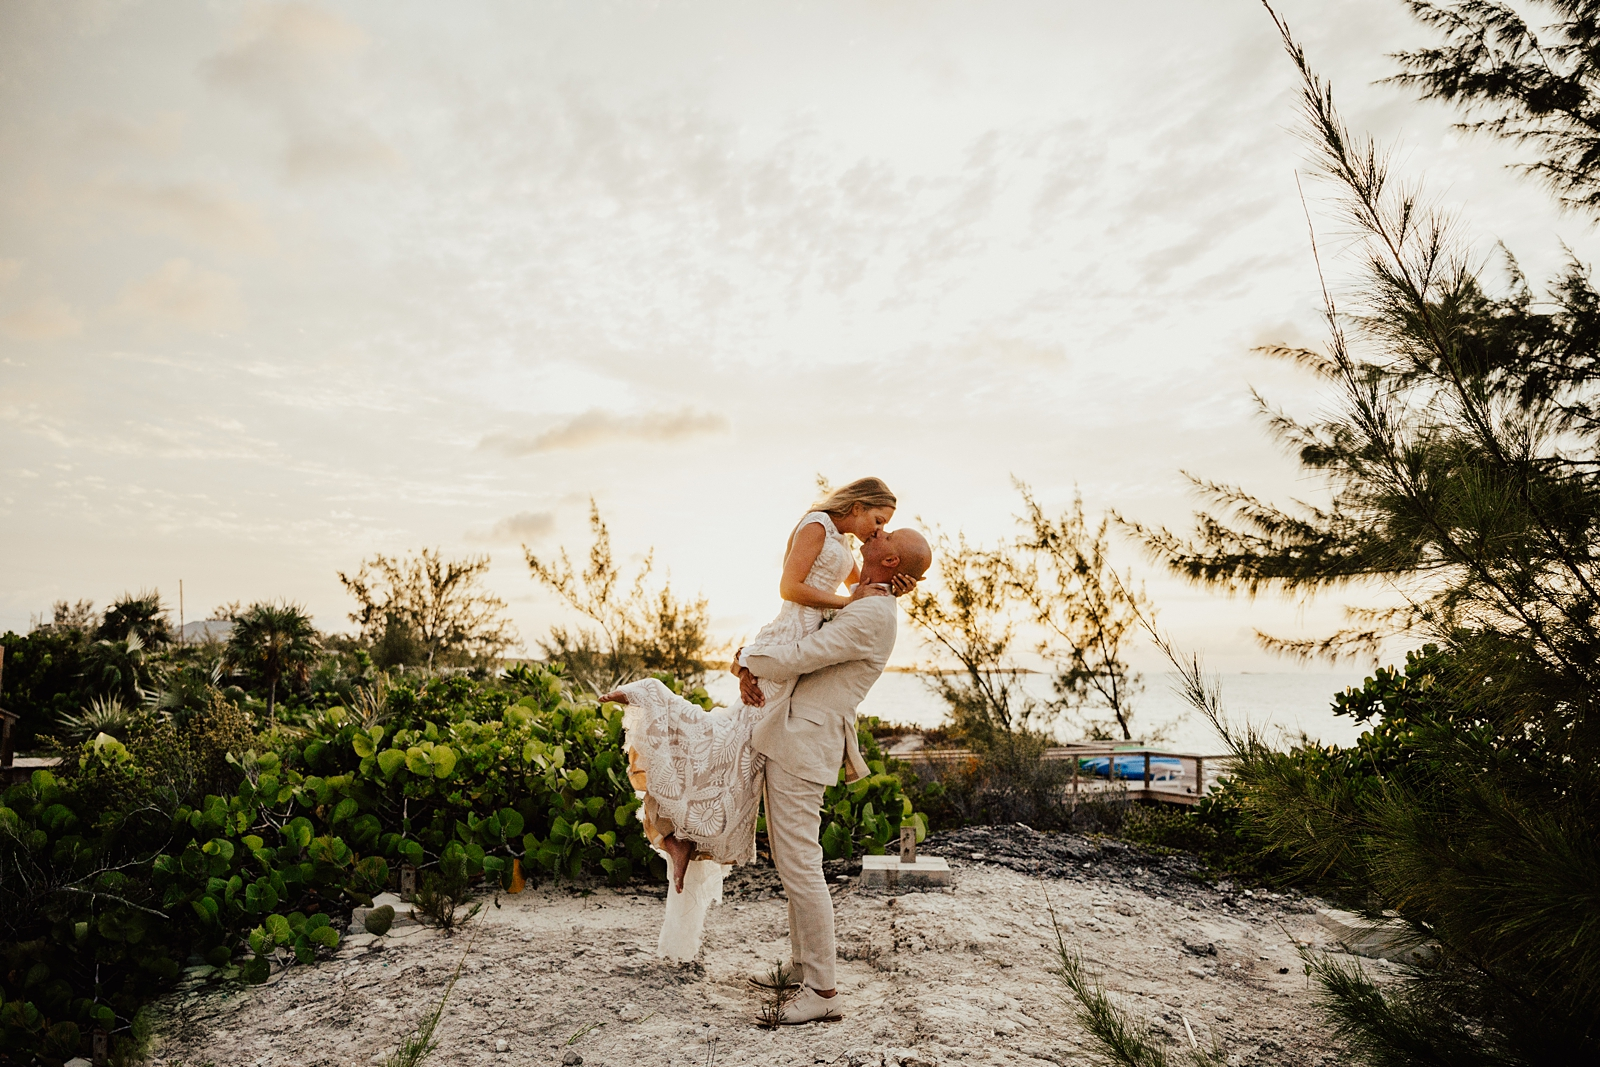 Jenni & Andrew Intimate Beach Destination Wedding in Little Exuma, Bahamas_0525.jpg